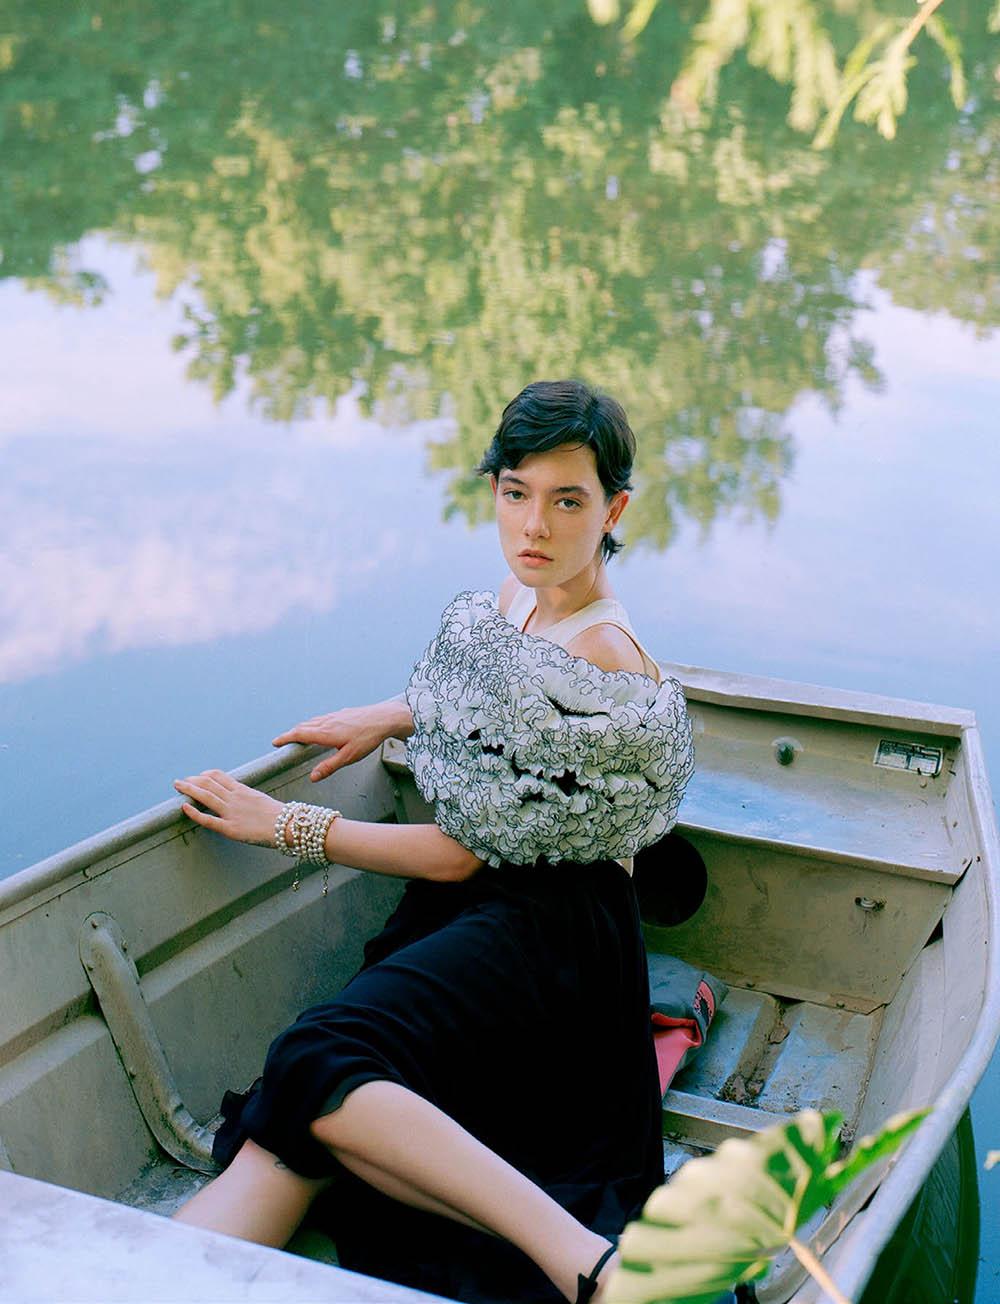 Kenna Matthews by Chris Scheurich for L'Officiel Singapore August 2020